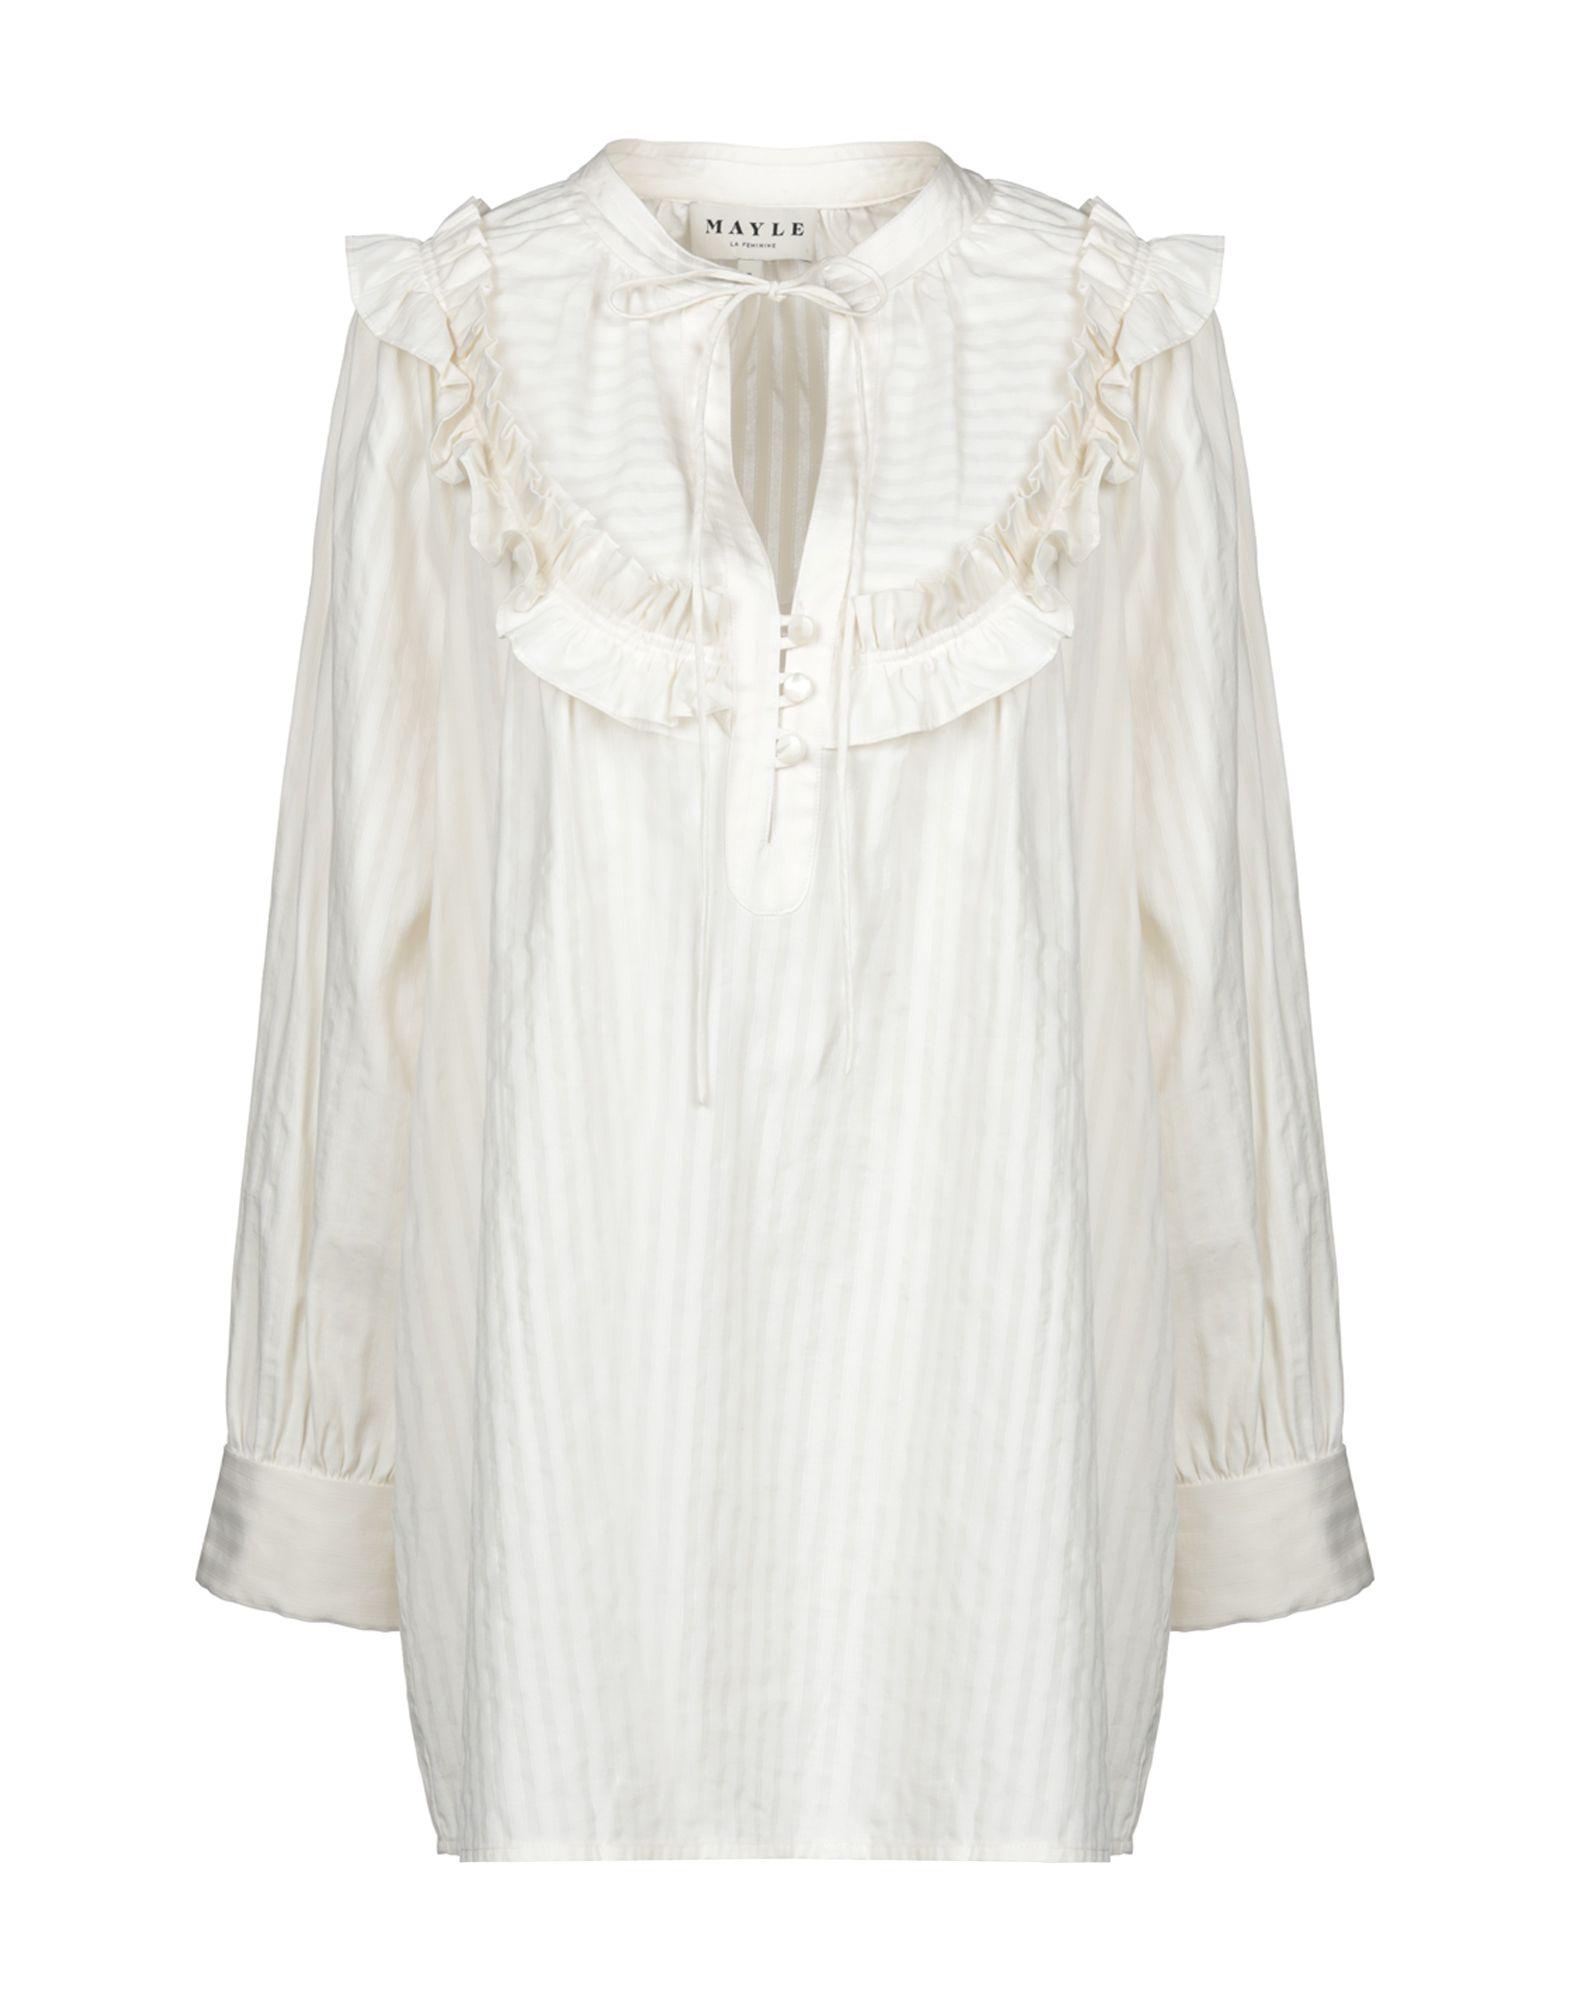 MAYLE Блузка ткань